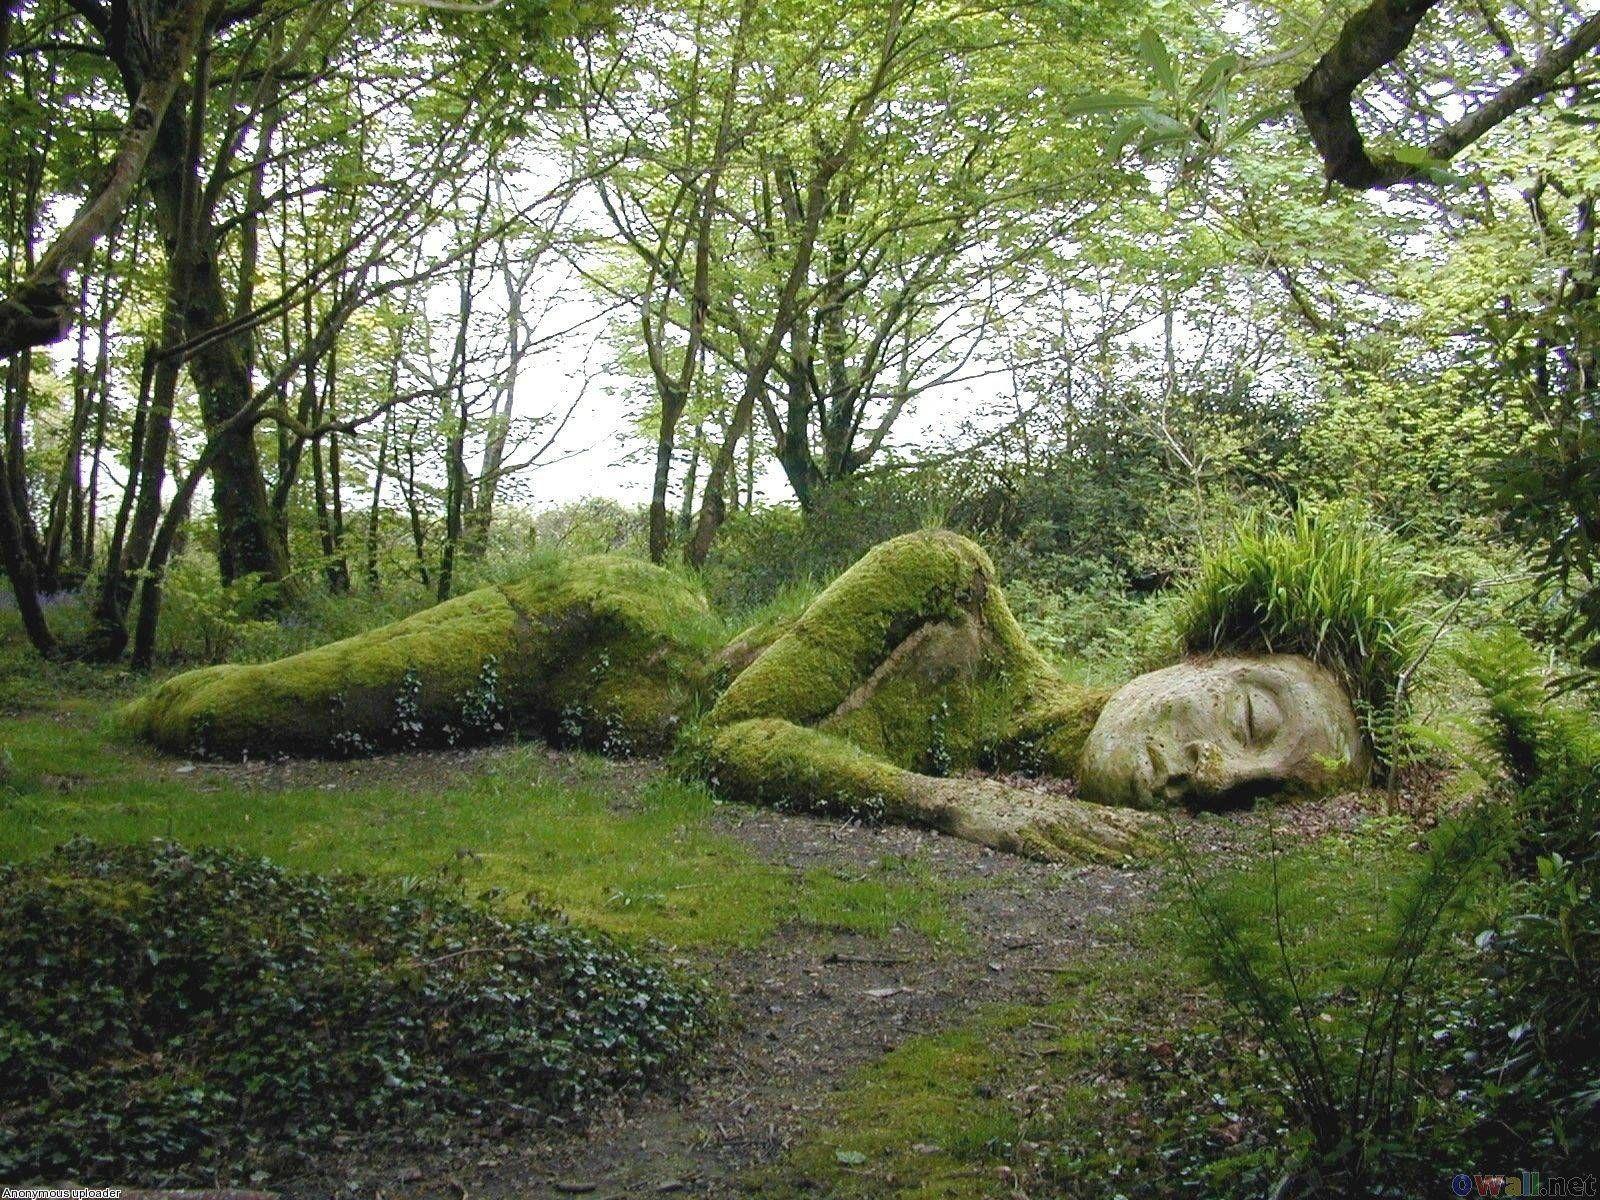 Sleeping Goddess Heligan England Lost Garden Lost Gardens Of Heligan Garden Art